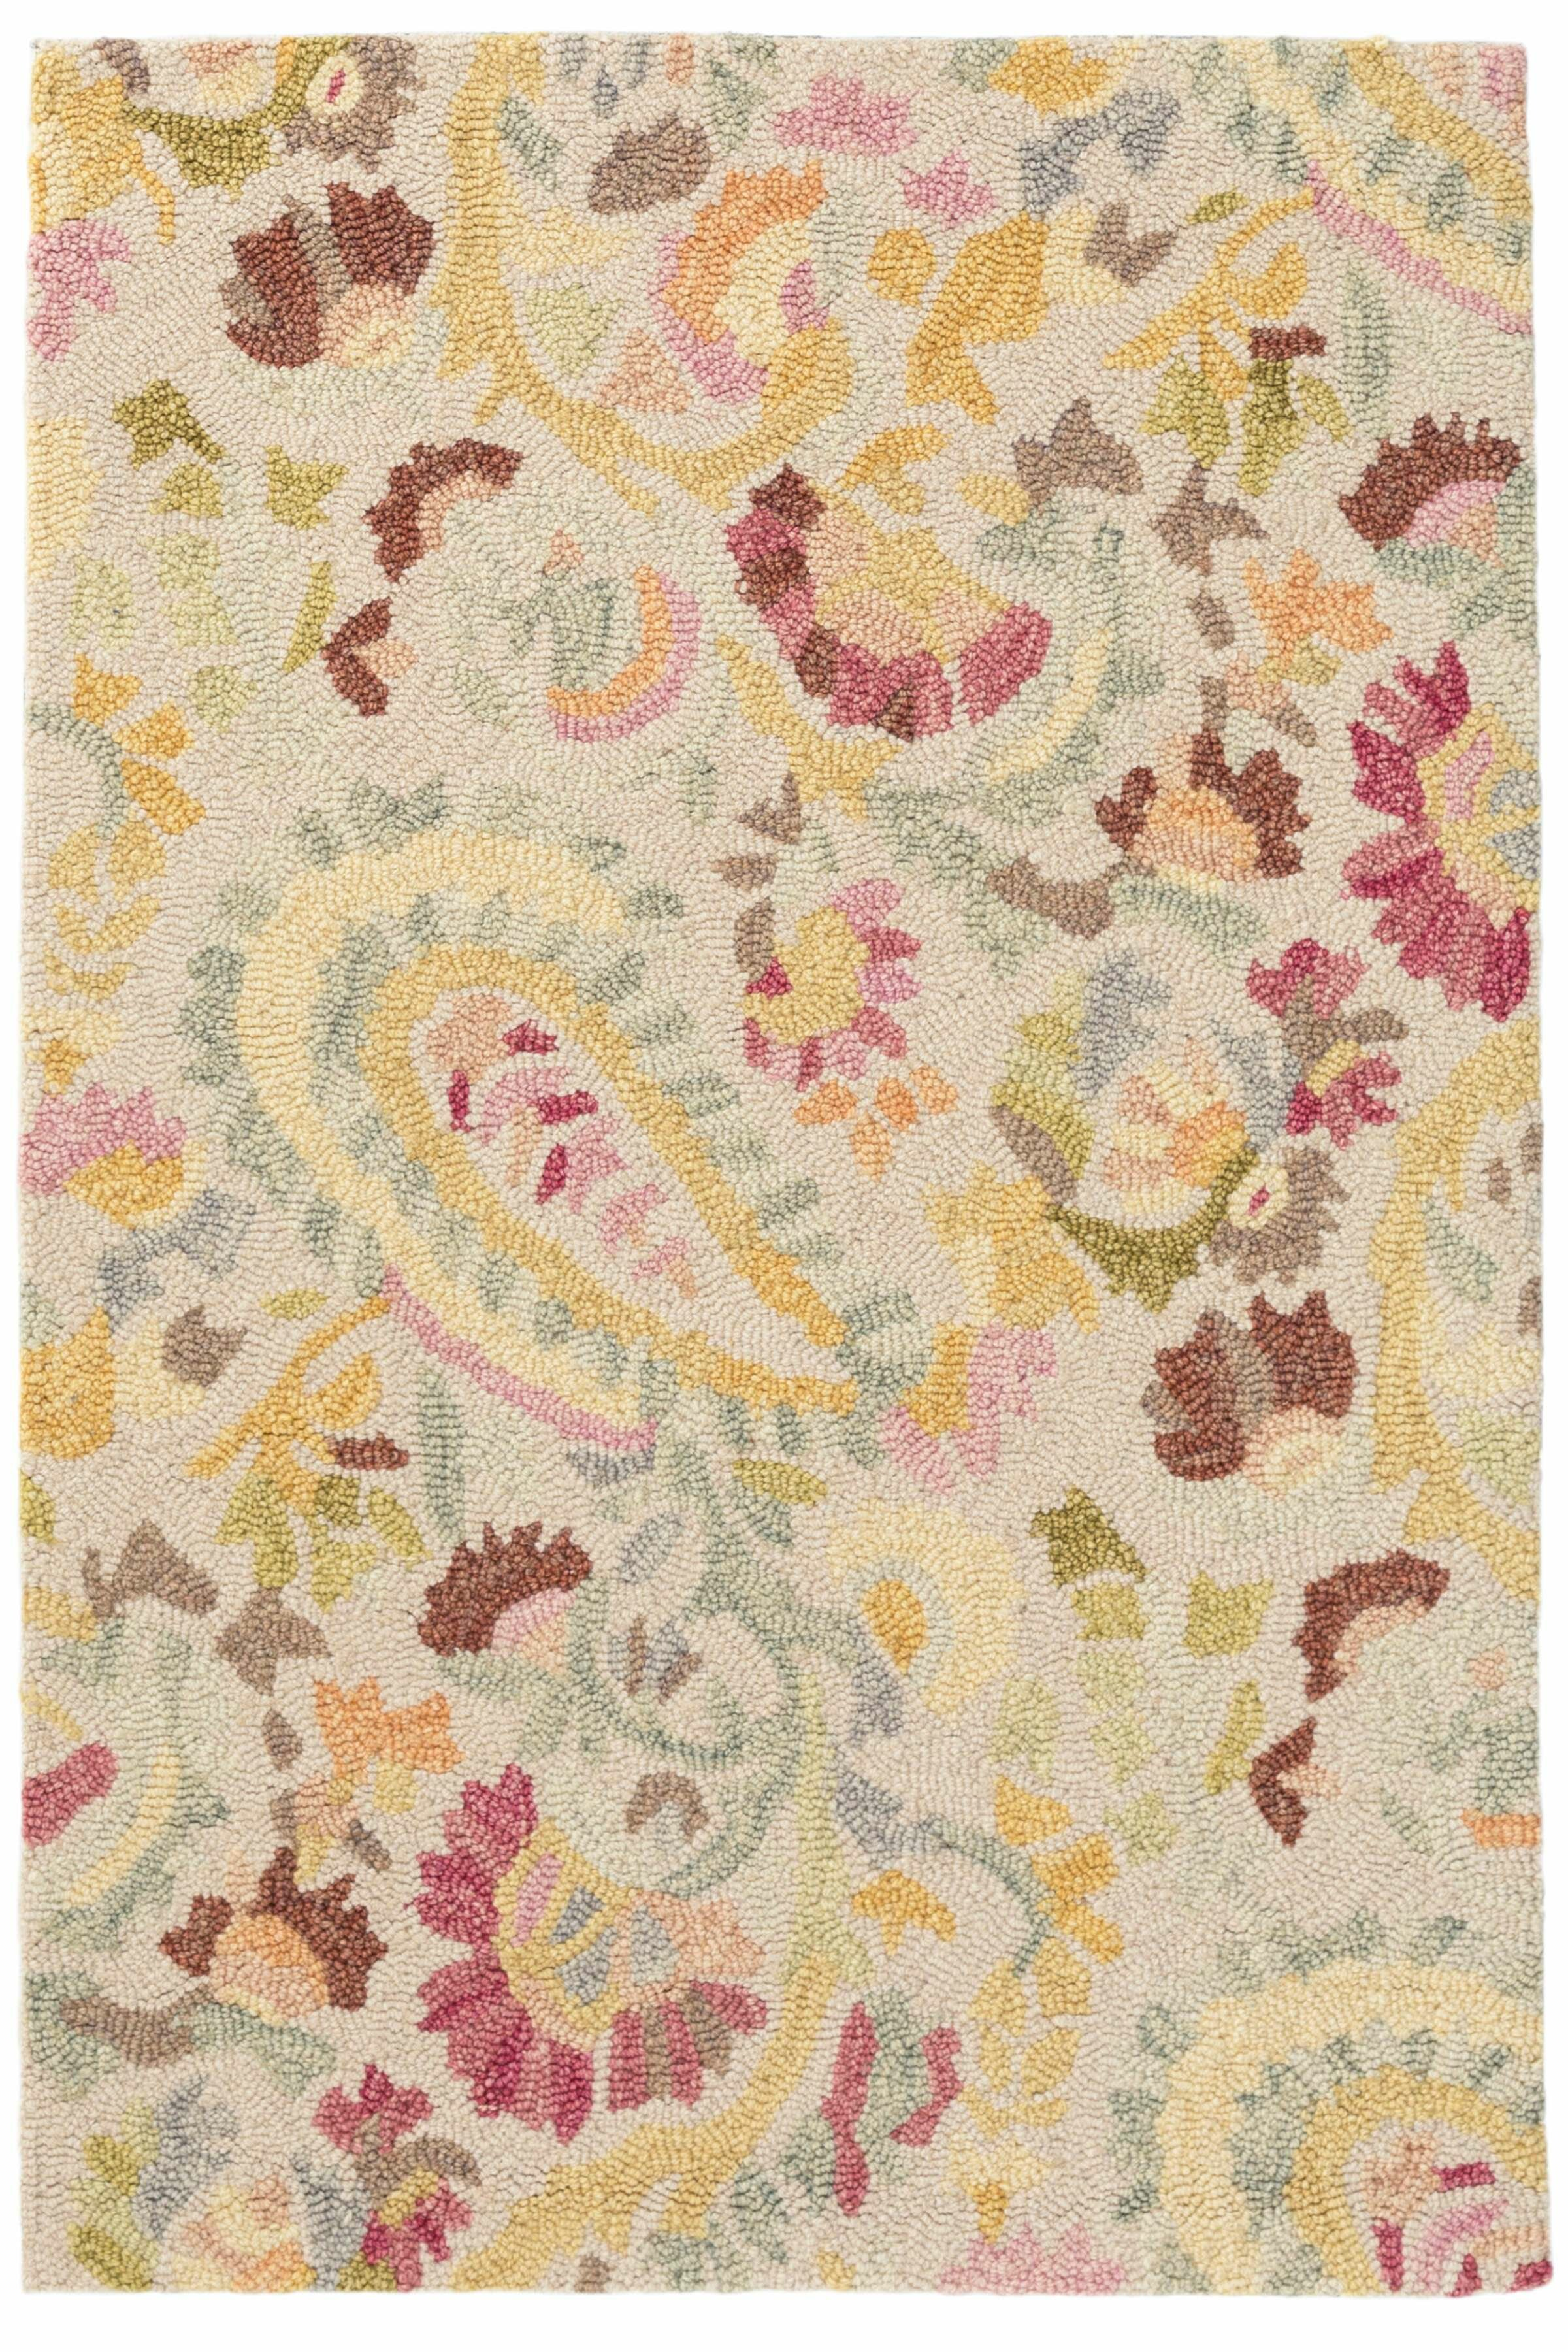 Dash And Albert Rugs Ines Paisley Beige Pink Yellow Wool Area Rug Reviews Perigold